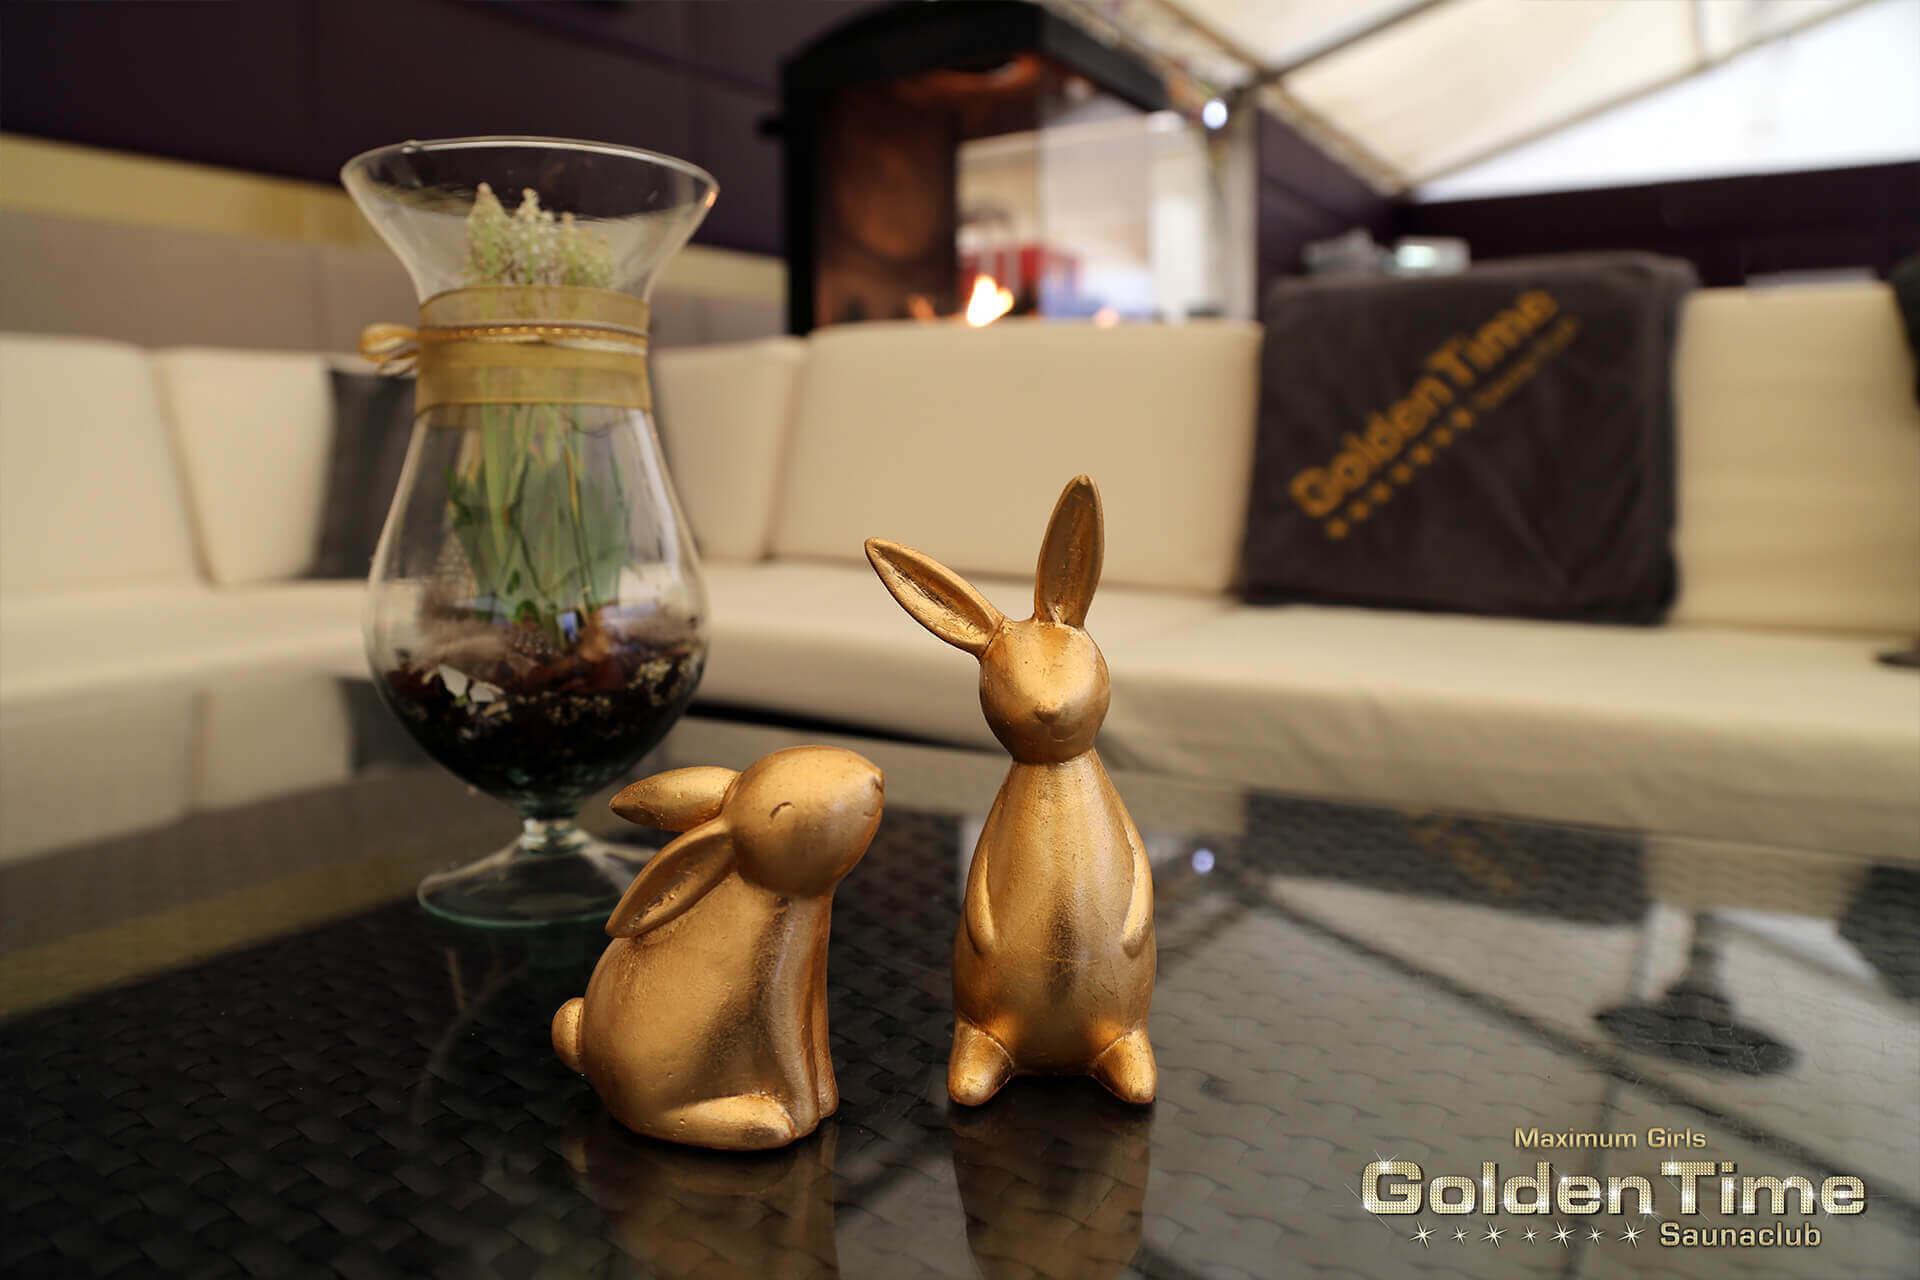 02-ostern-2016-pic-25-goldentime-saunaclub.jpg